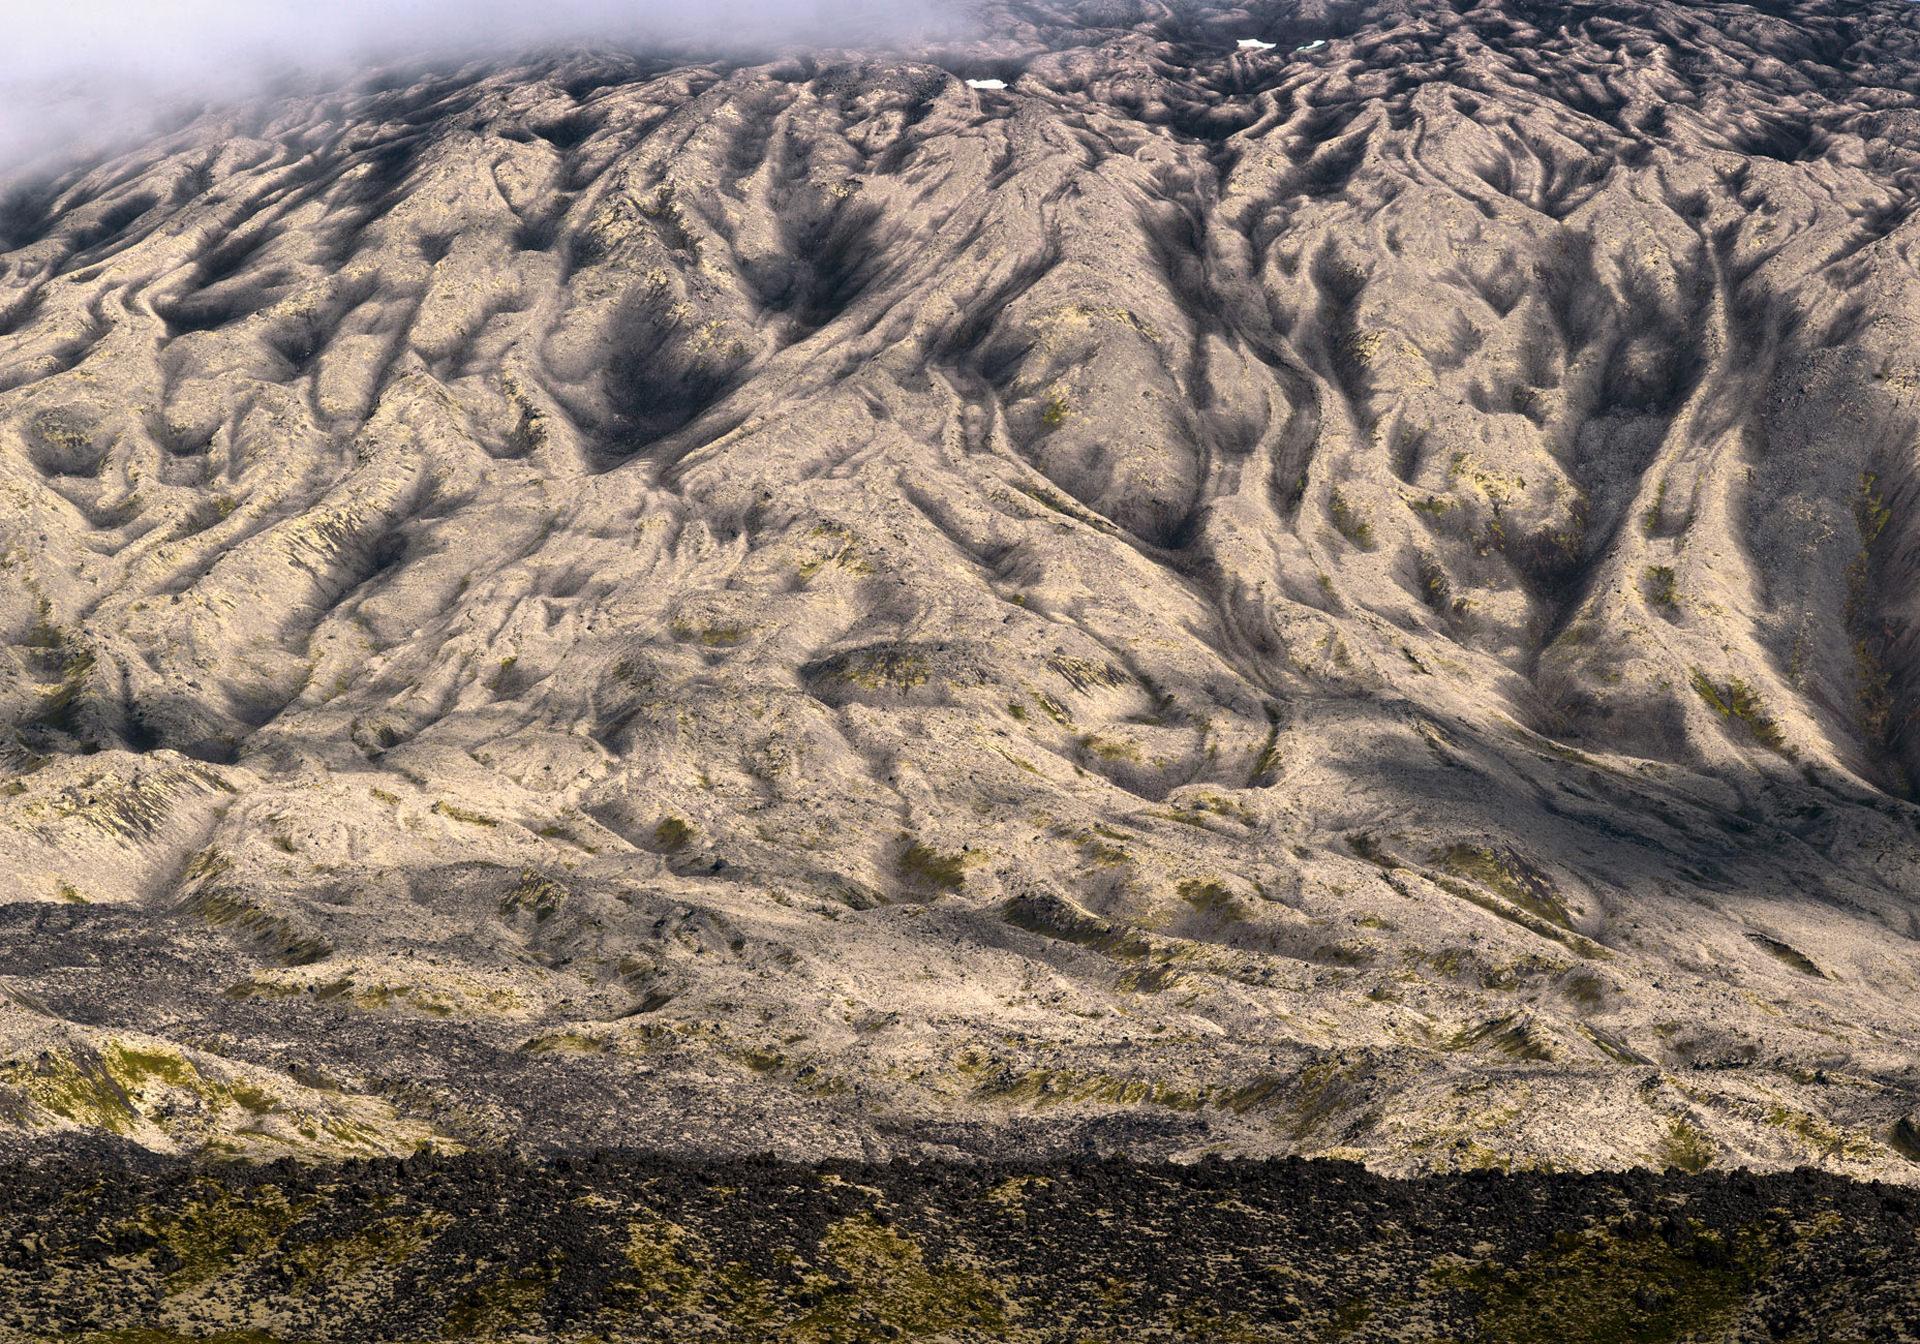 2006 09 05 iceland 0042, landscape, personal work, mountain, www.ankeluckmann.com, anke luckmann,